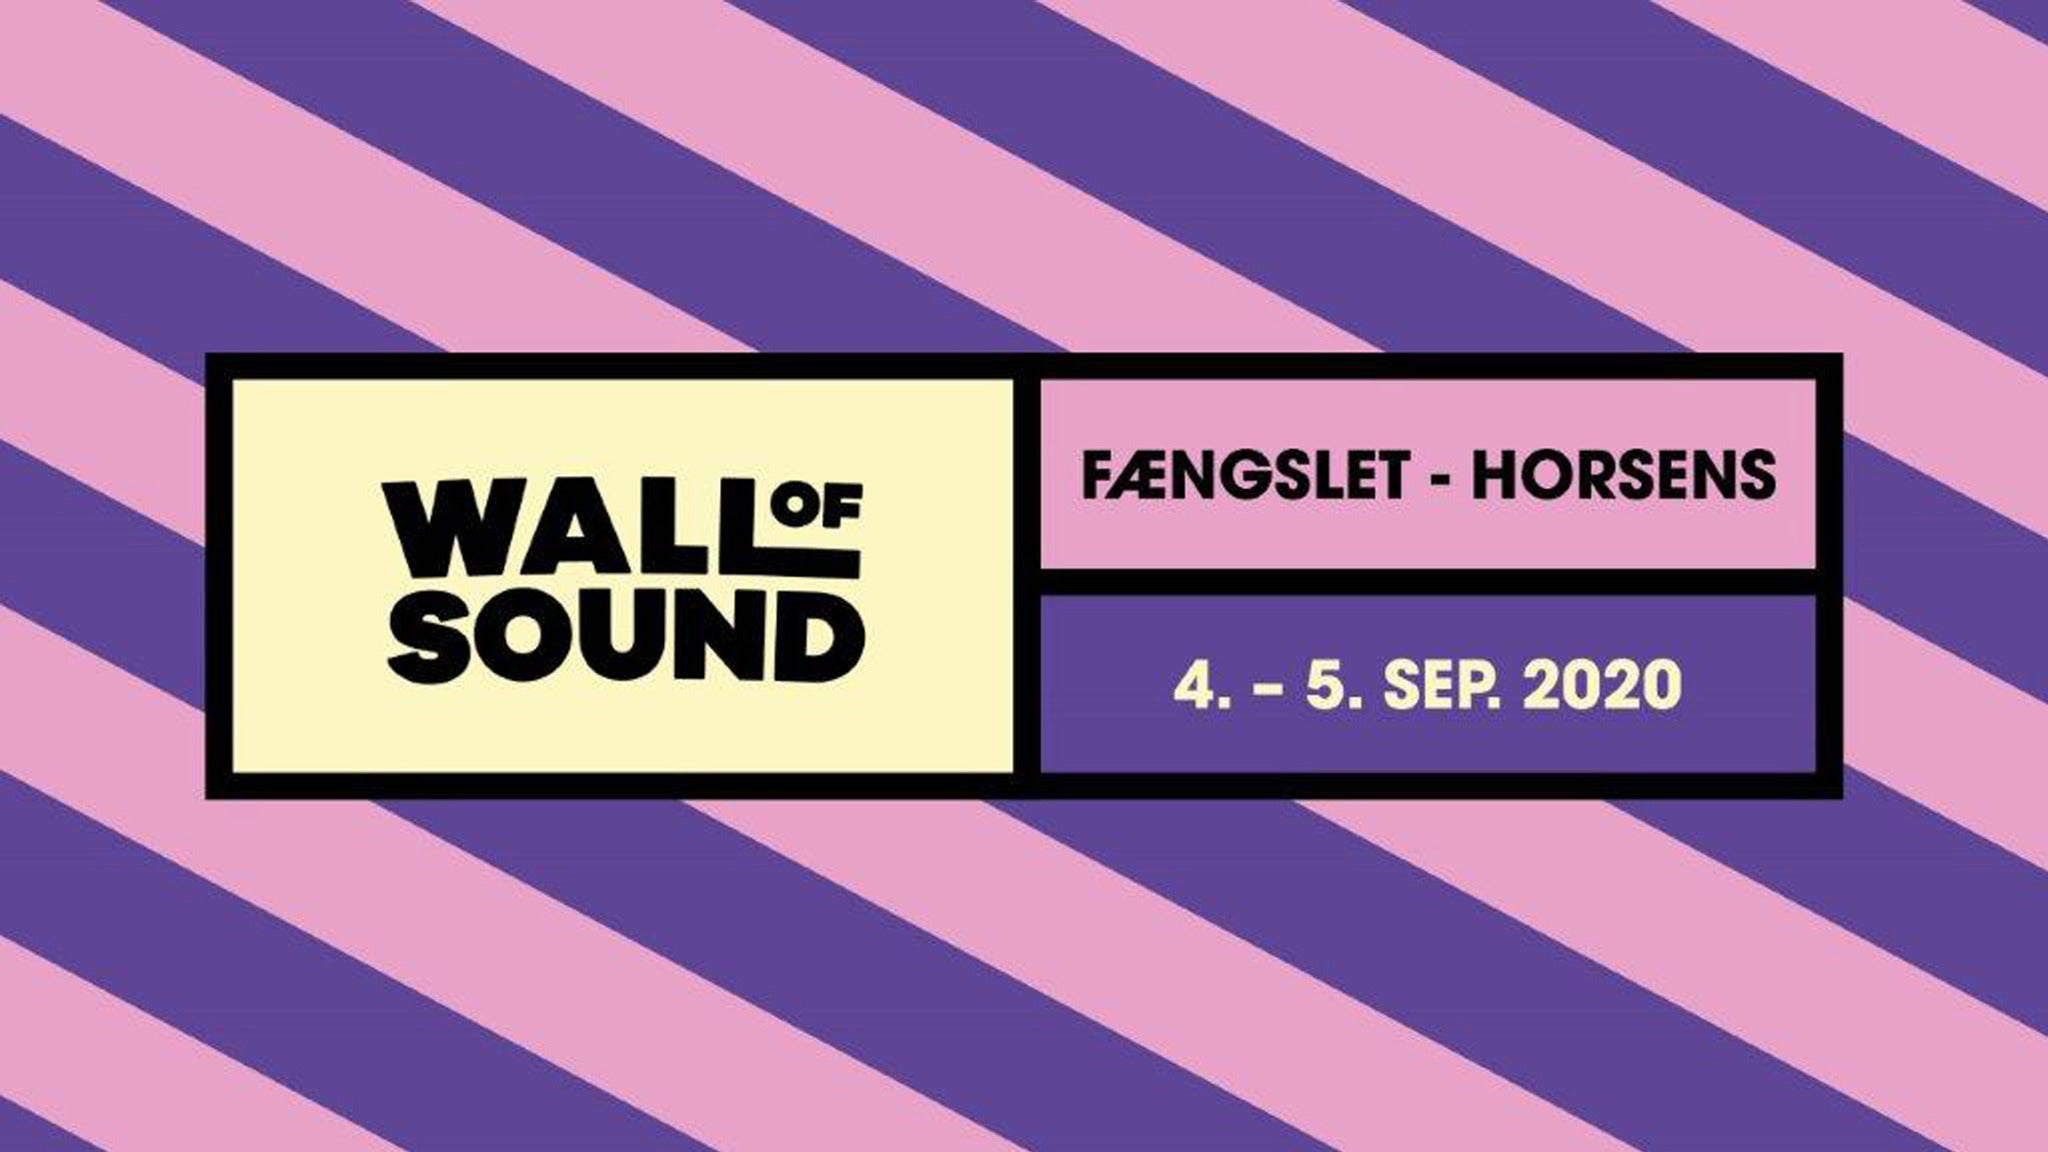 Wall Of Sound - Fredagsbillet